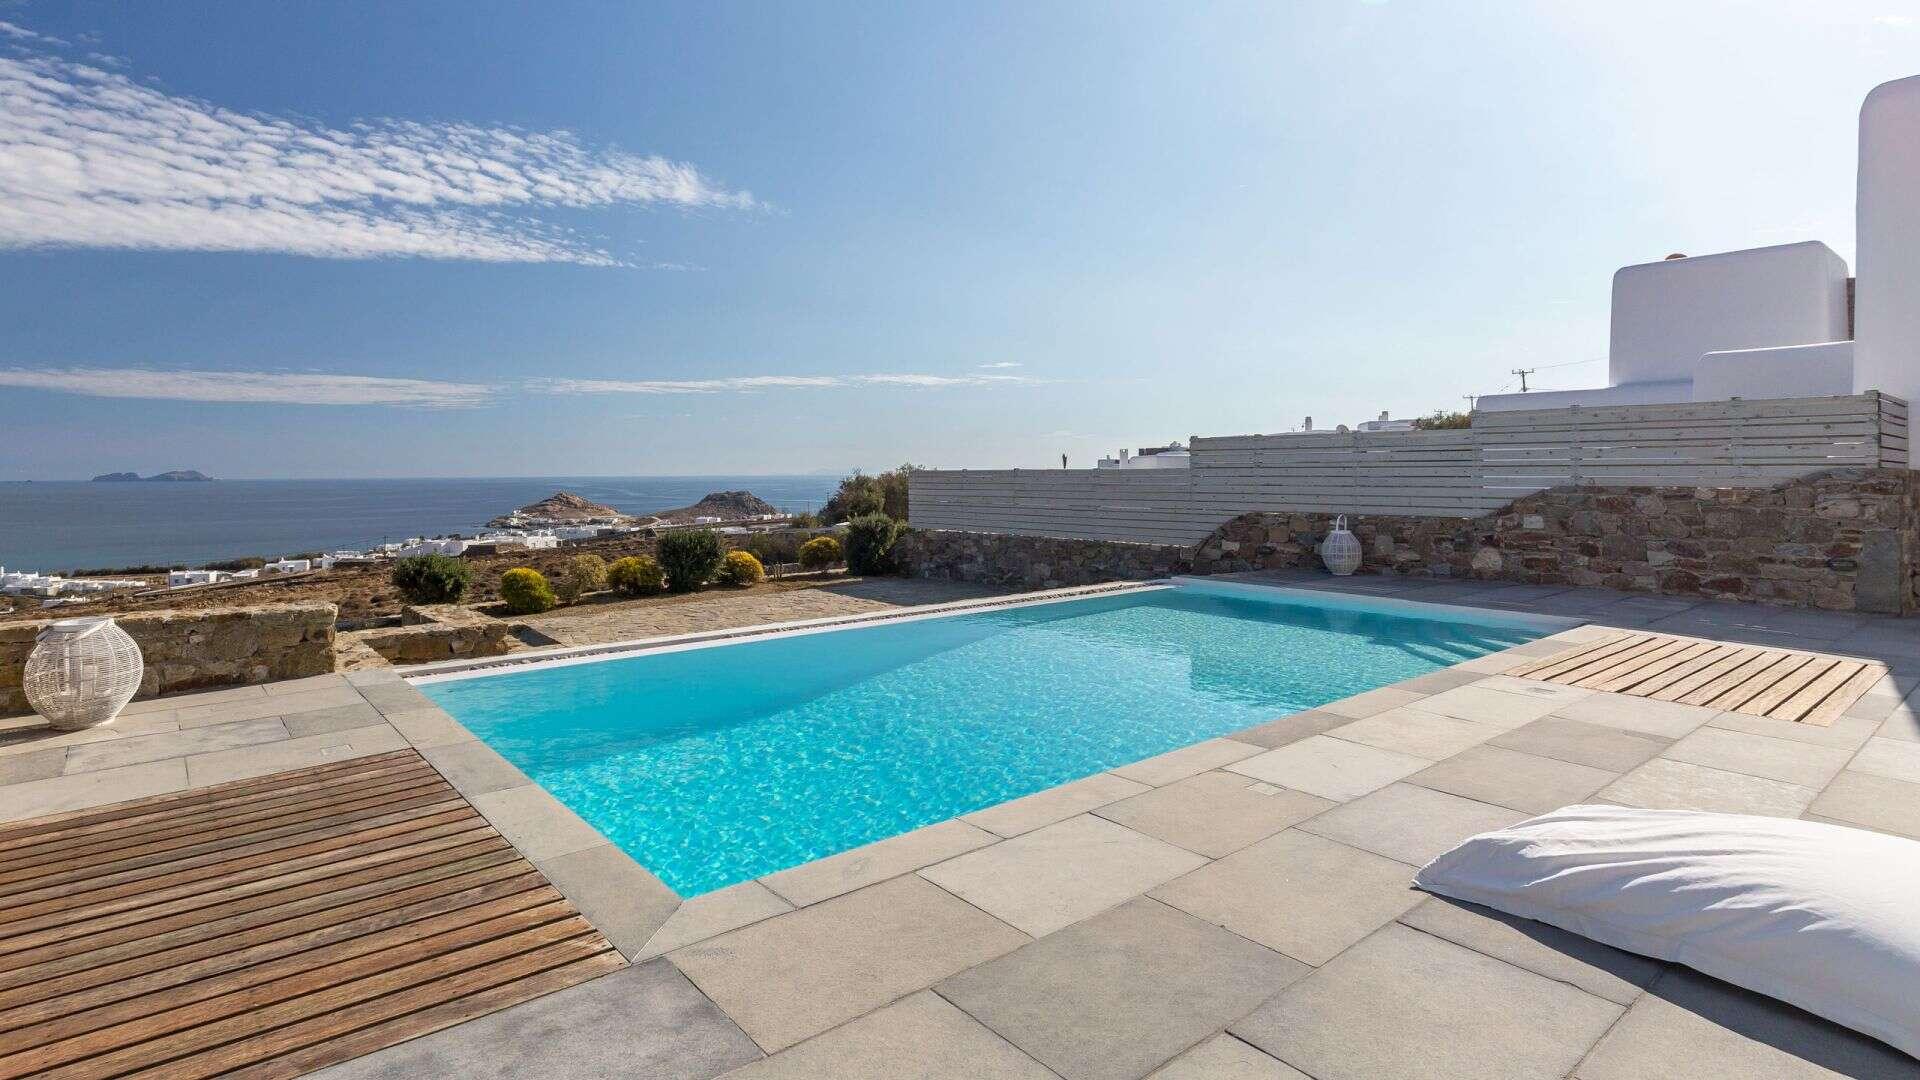 Luxury vacation rentals europe - Greece - Mykonos - Kalafatis - Poseidon 2 - Image 1/12